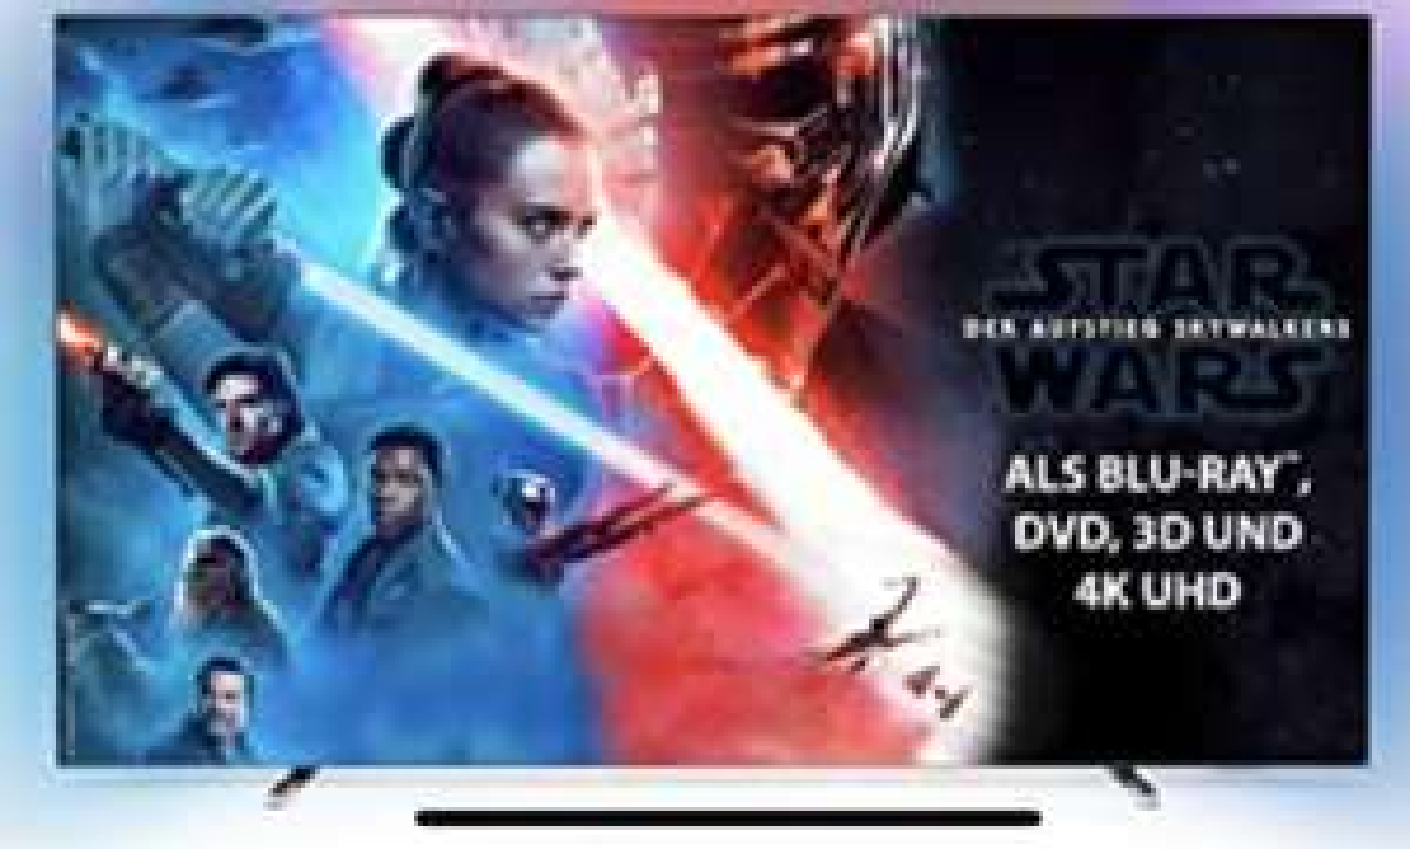 Philips Ambilight 55OLED804 139 cm (55 Zoll) OledTV (4K UHD, HDR10+, Android TV, Dolby Vision, Google Assistant, Alexa kompatibel)